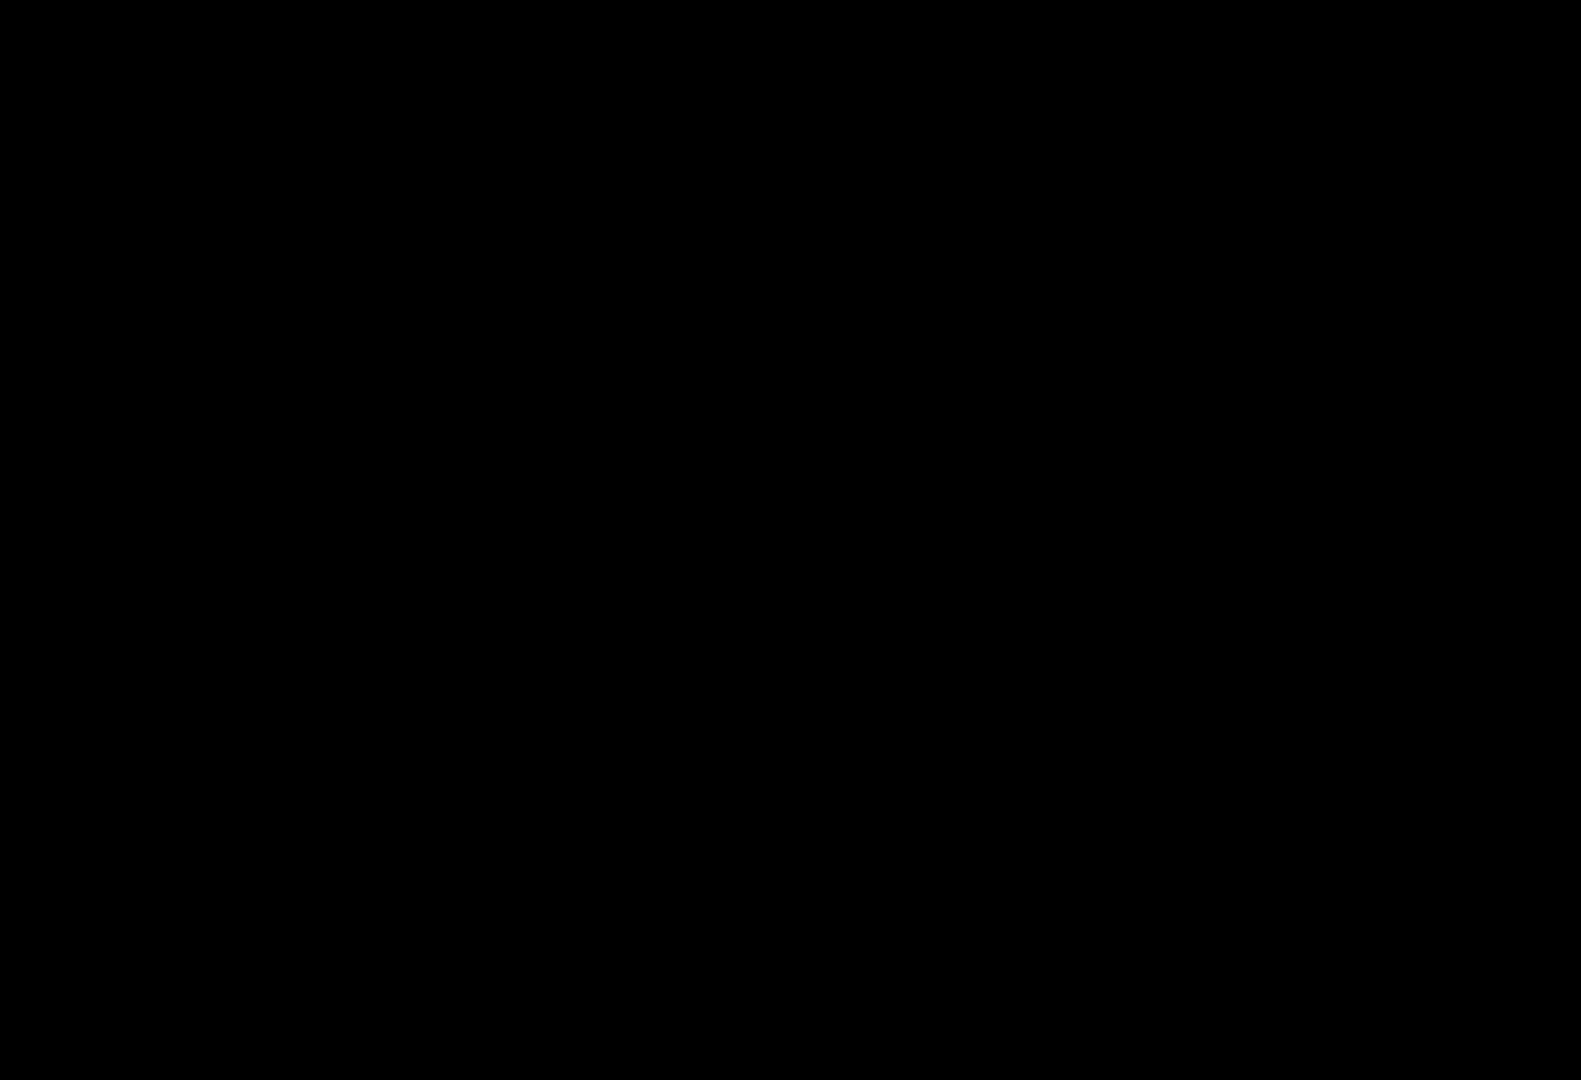 Кабинет корень Лаурель